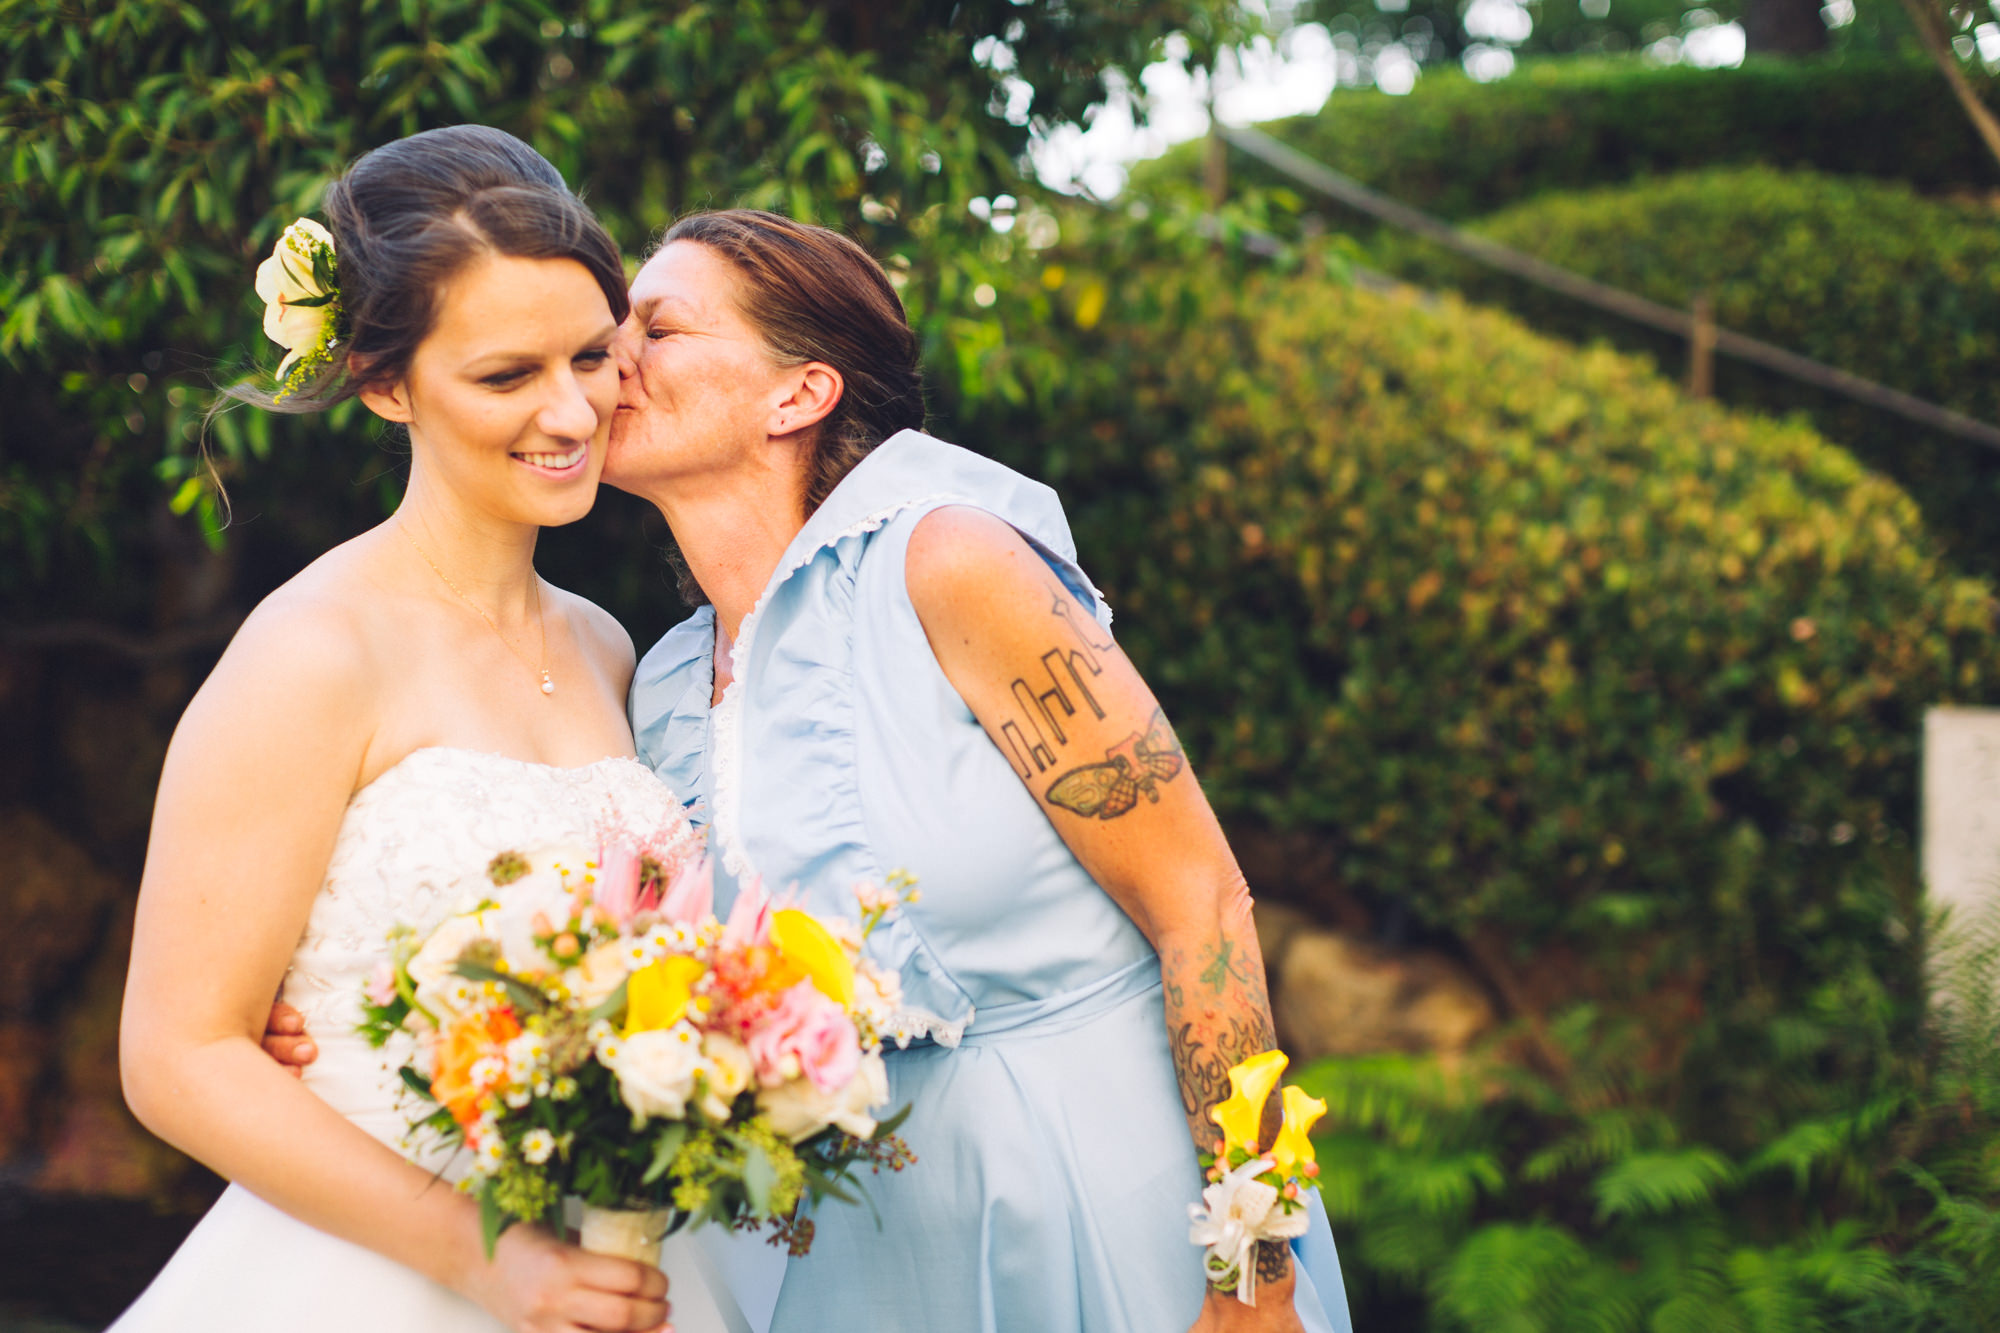 thelightandglass-wedding-engagement-photography-076.jpg